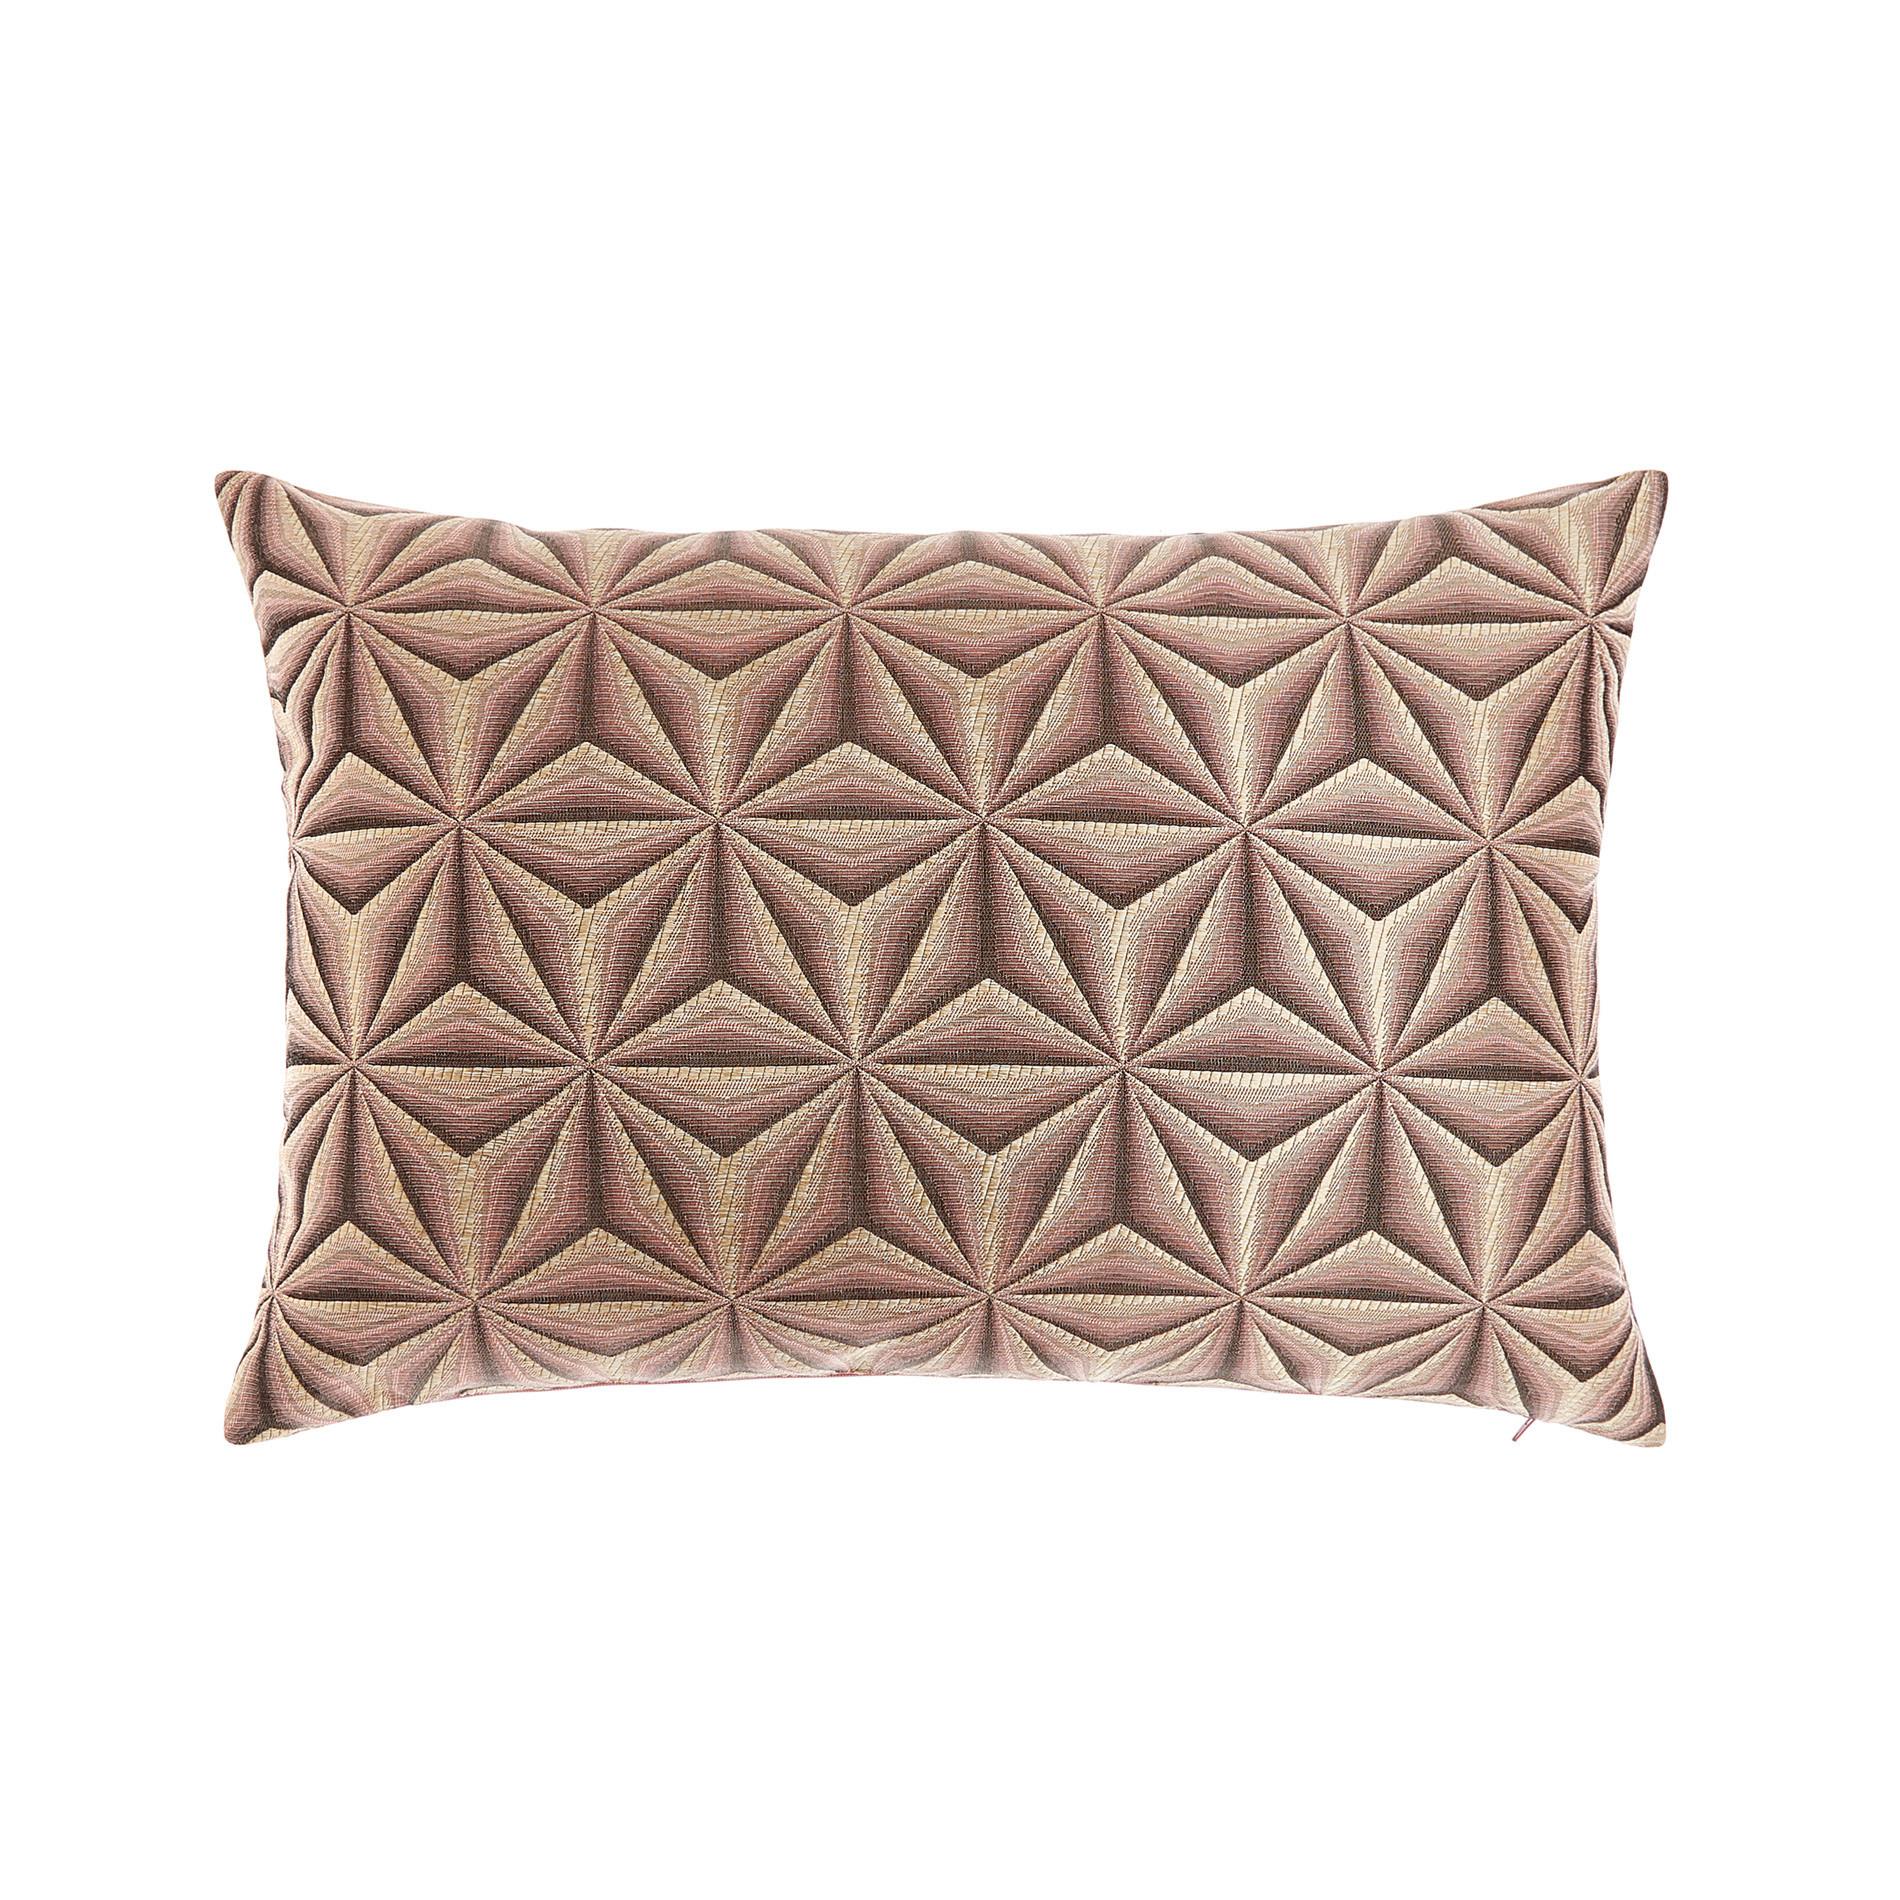 Cuscino jacquard geometrico 35x55cm coincasa